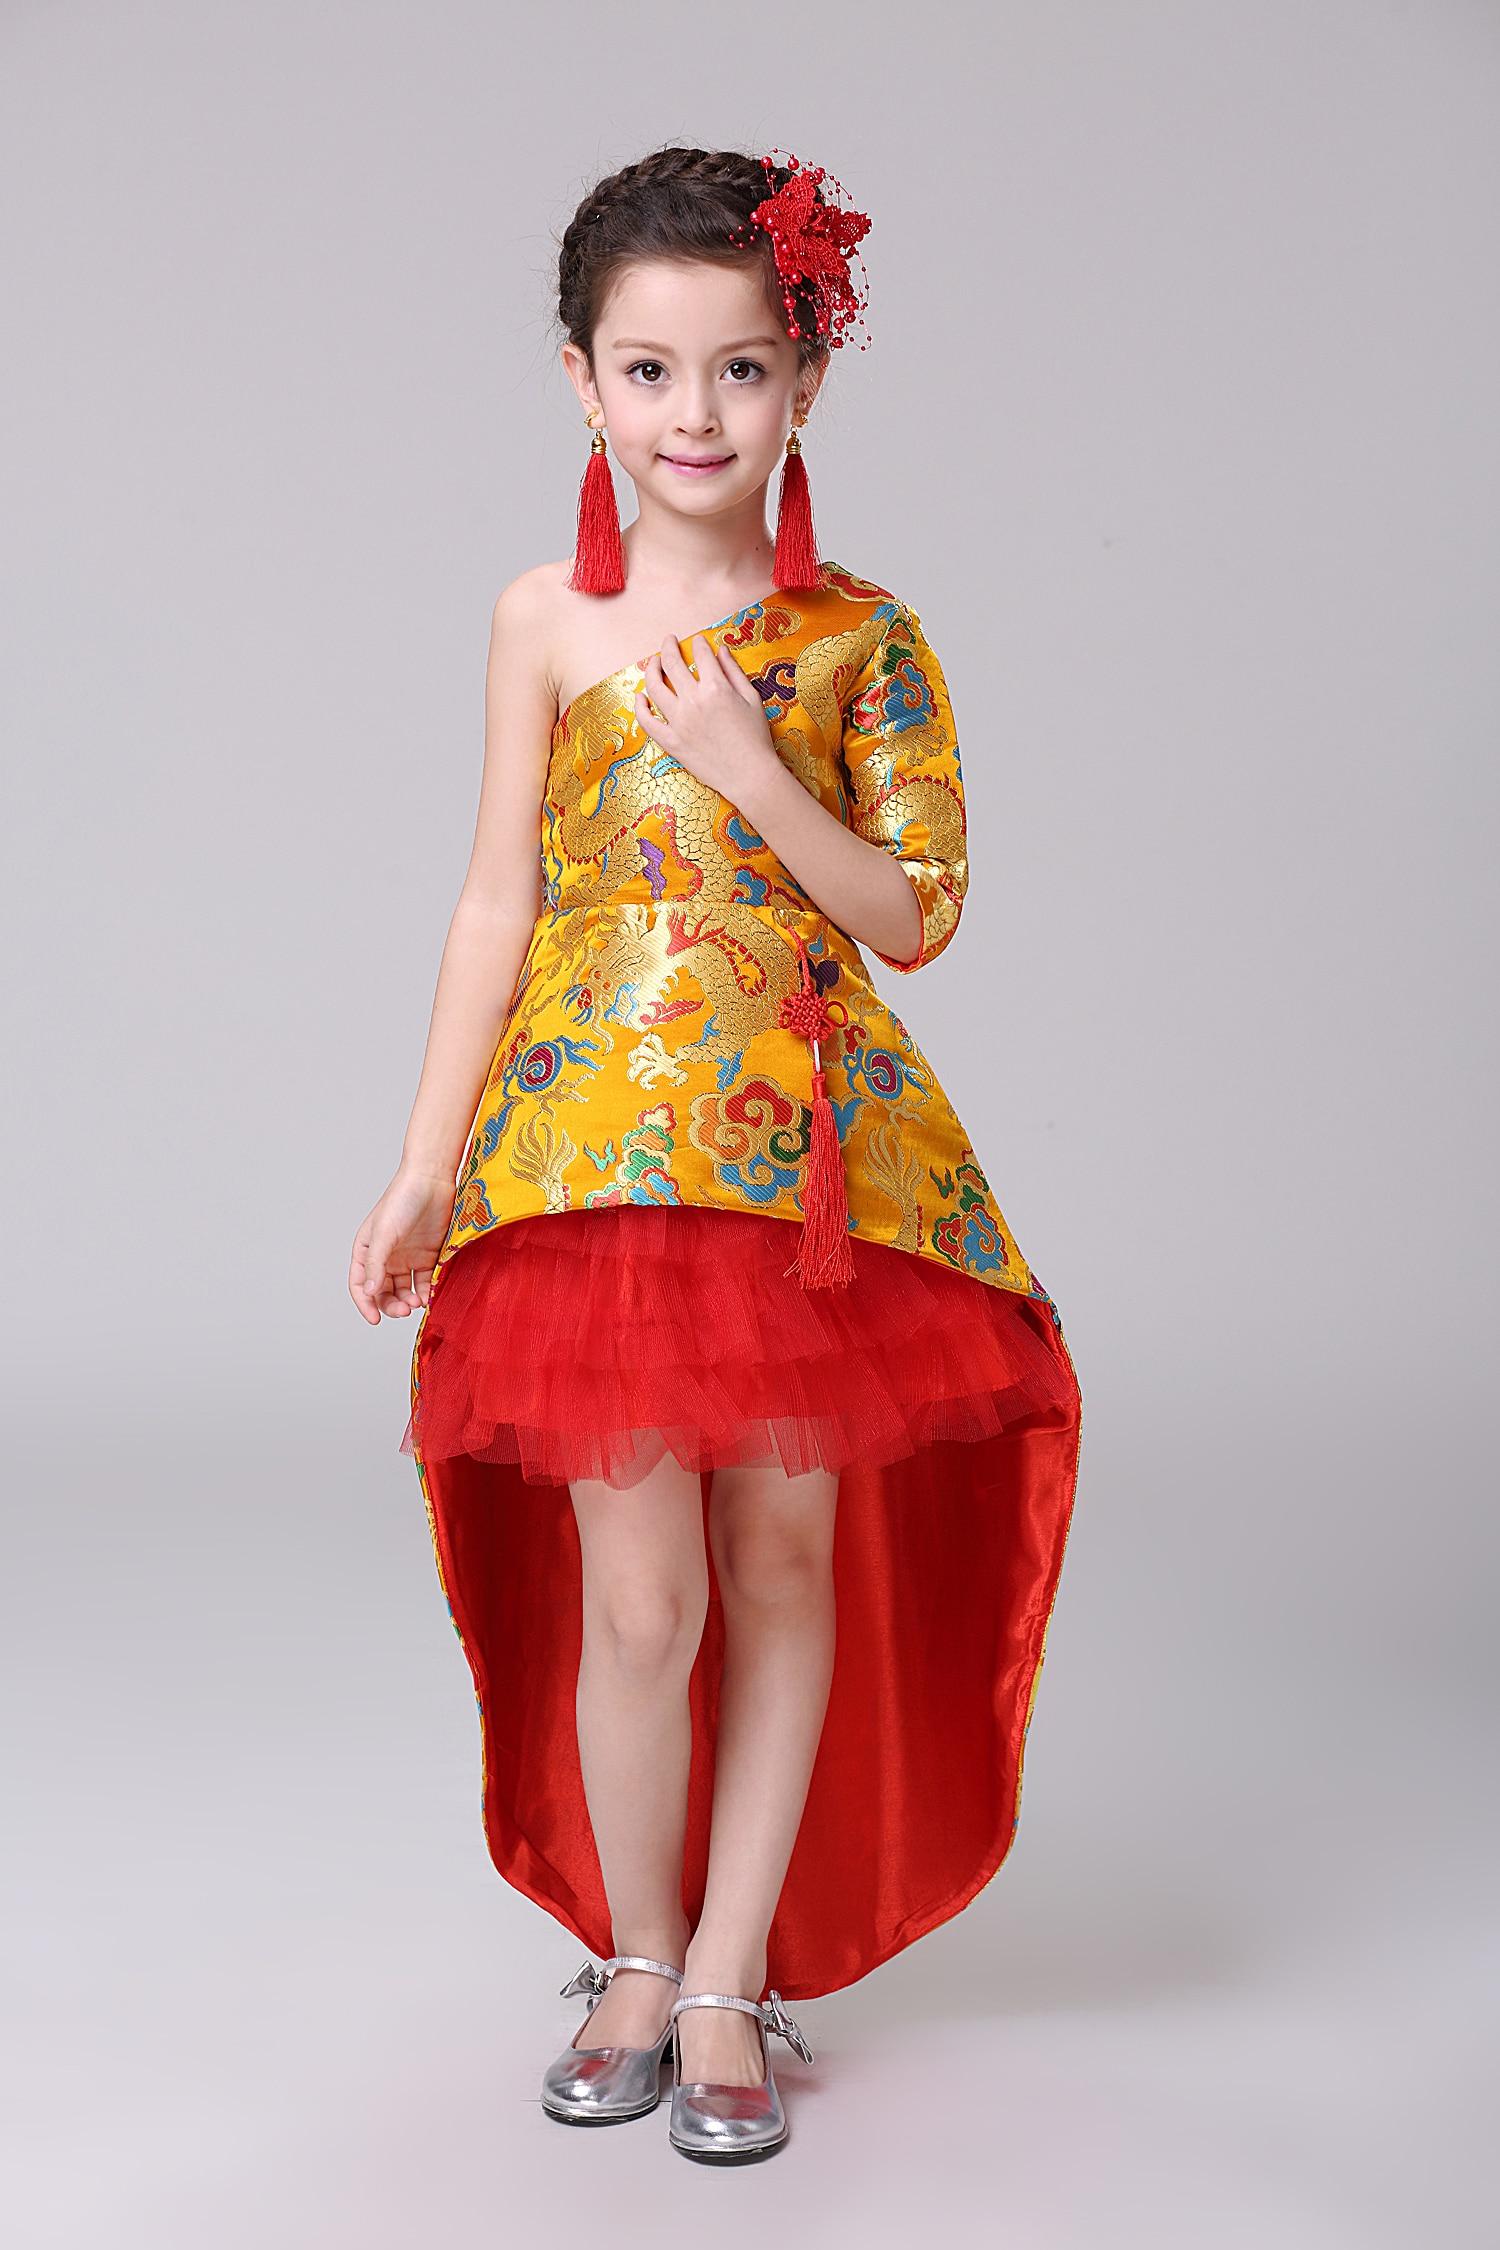 Enfants Flamenco robe fille princesse robe enfants traînant jupes chinois traditionnel robe Cheongsam étudiant enfants danse porter